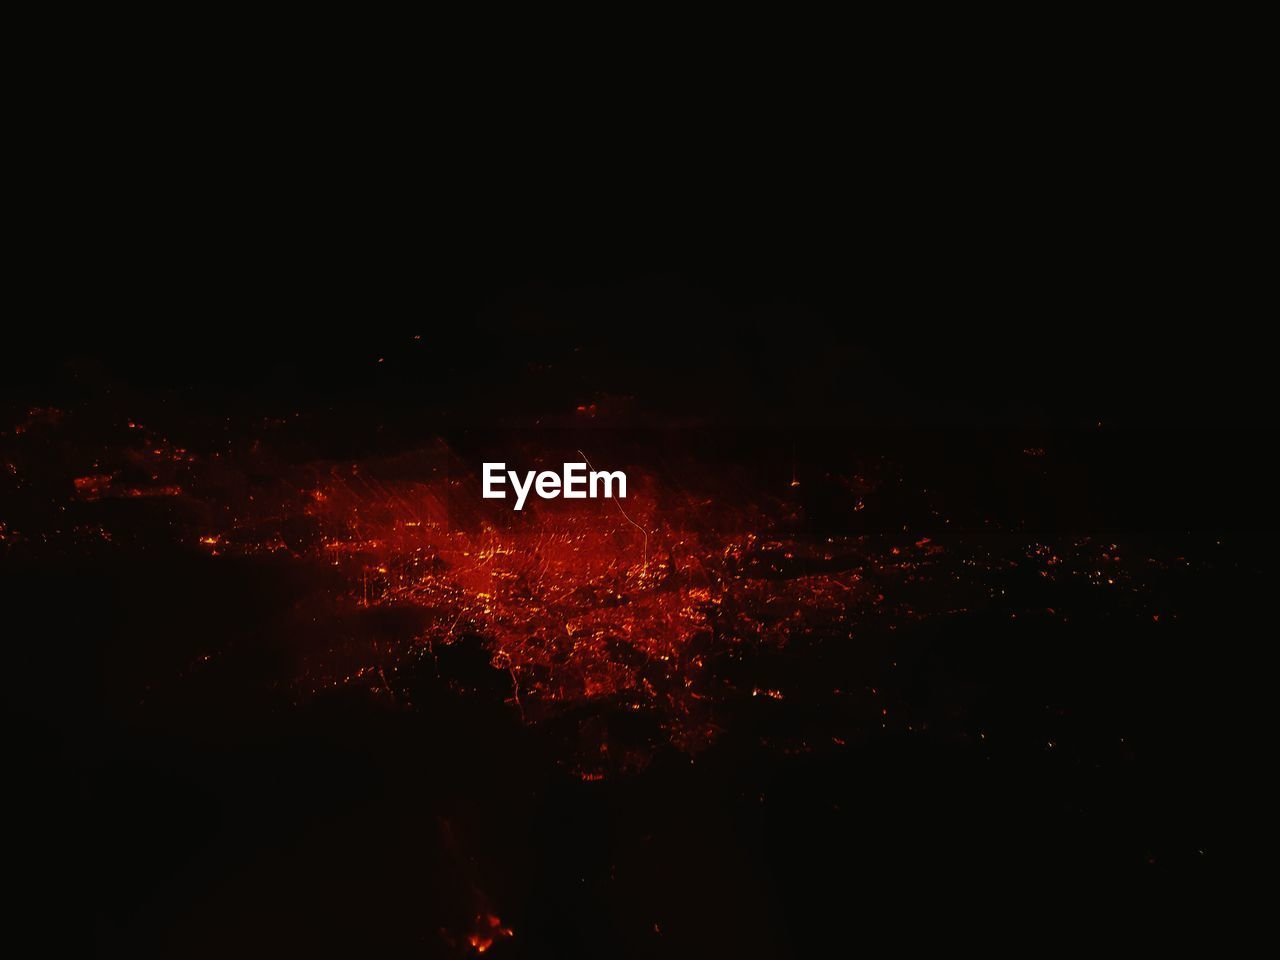 night, dark, no people, firework display, long exposure, illuminated, outdoors, nature